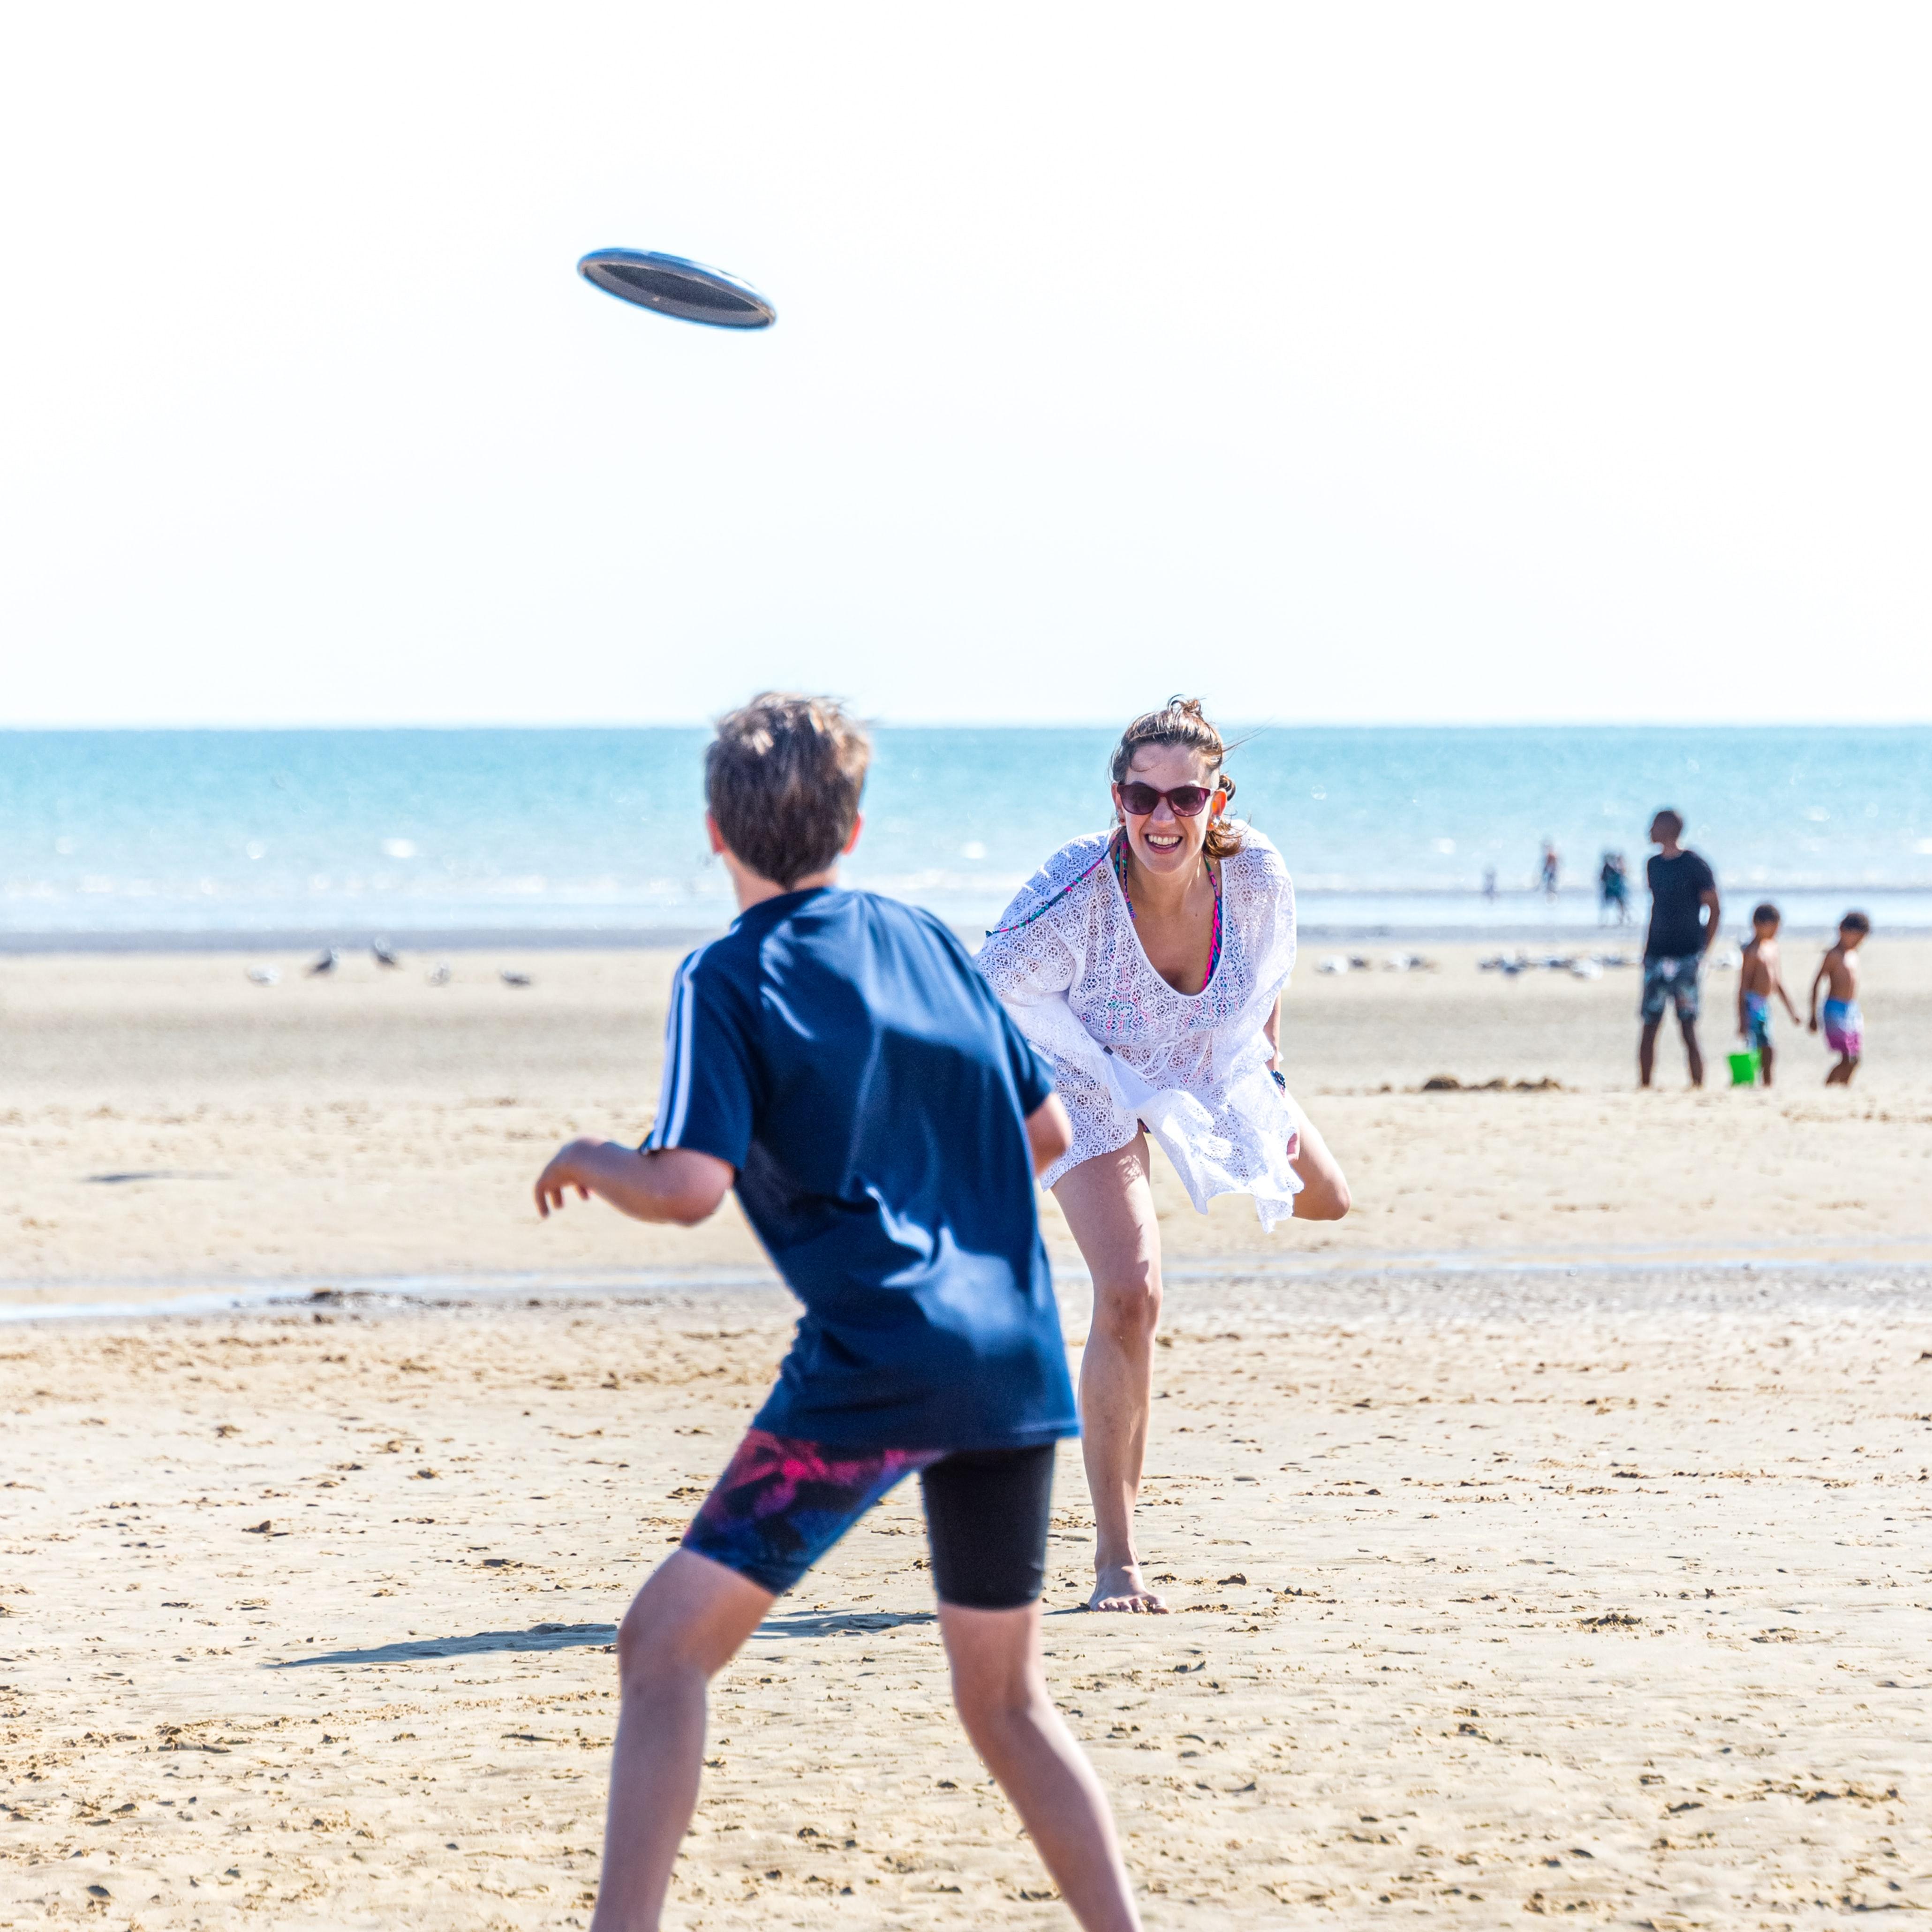 Woman plays frisbee on beach with teenage boy